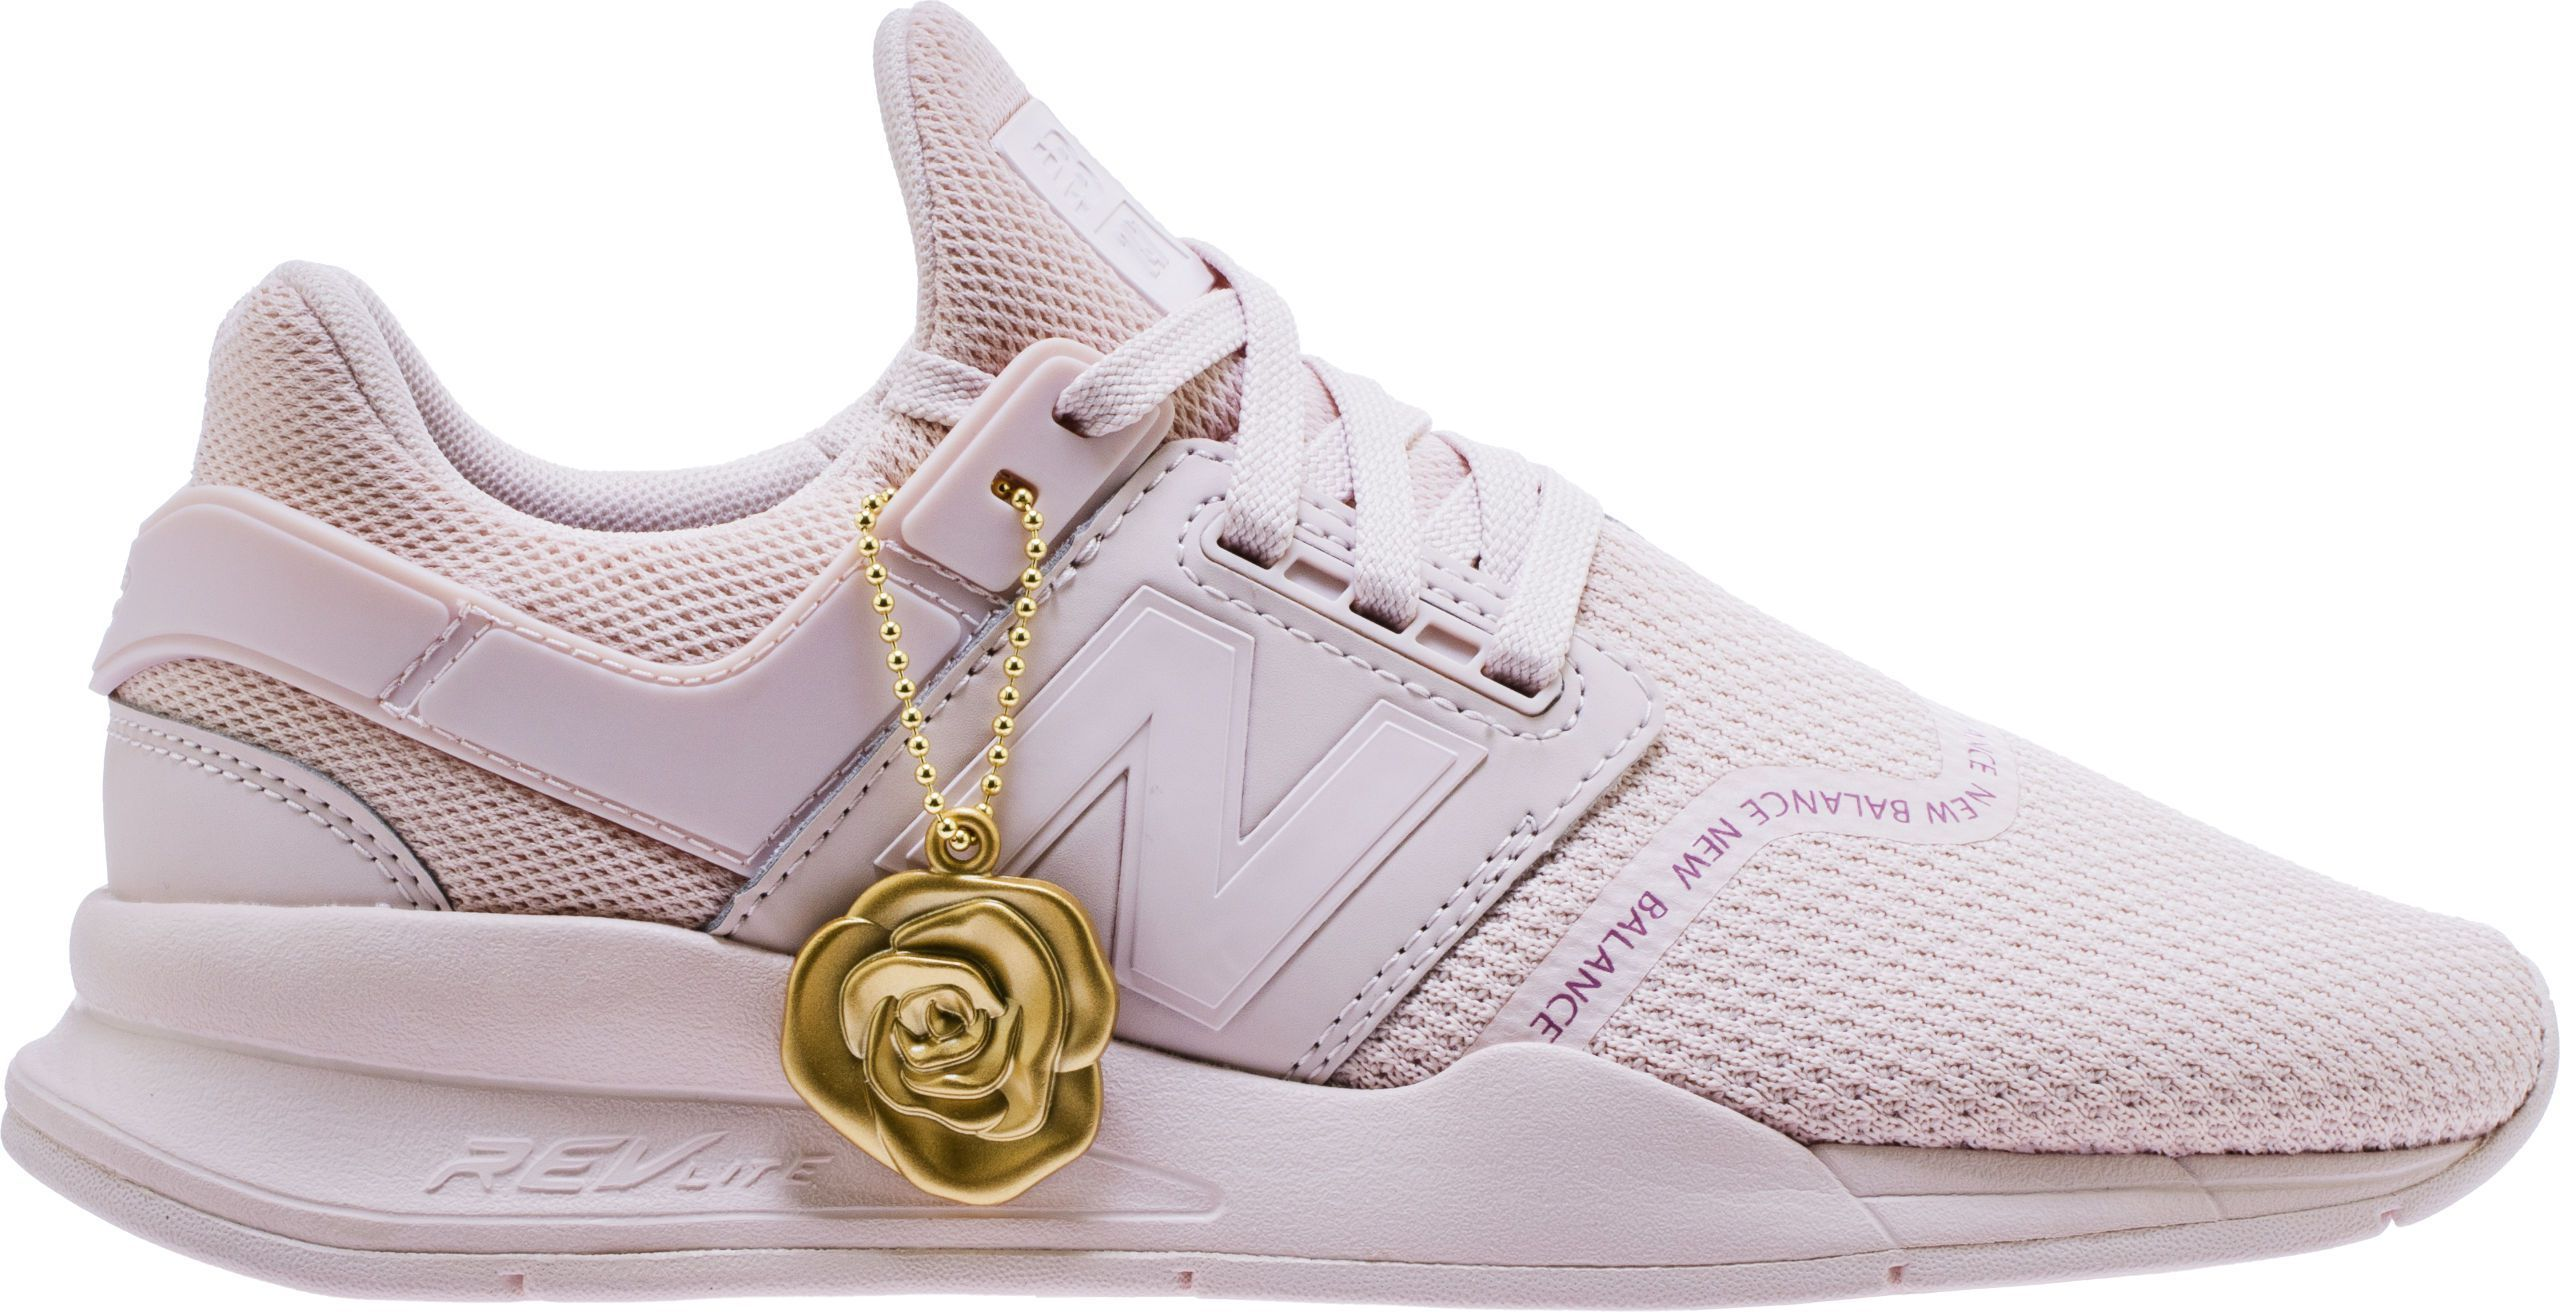 28aee9b41f4 10 Best New Balance 247s | New Balance Sneakers 2019